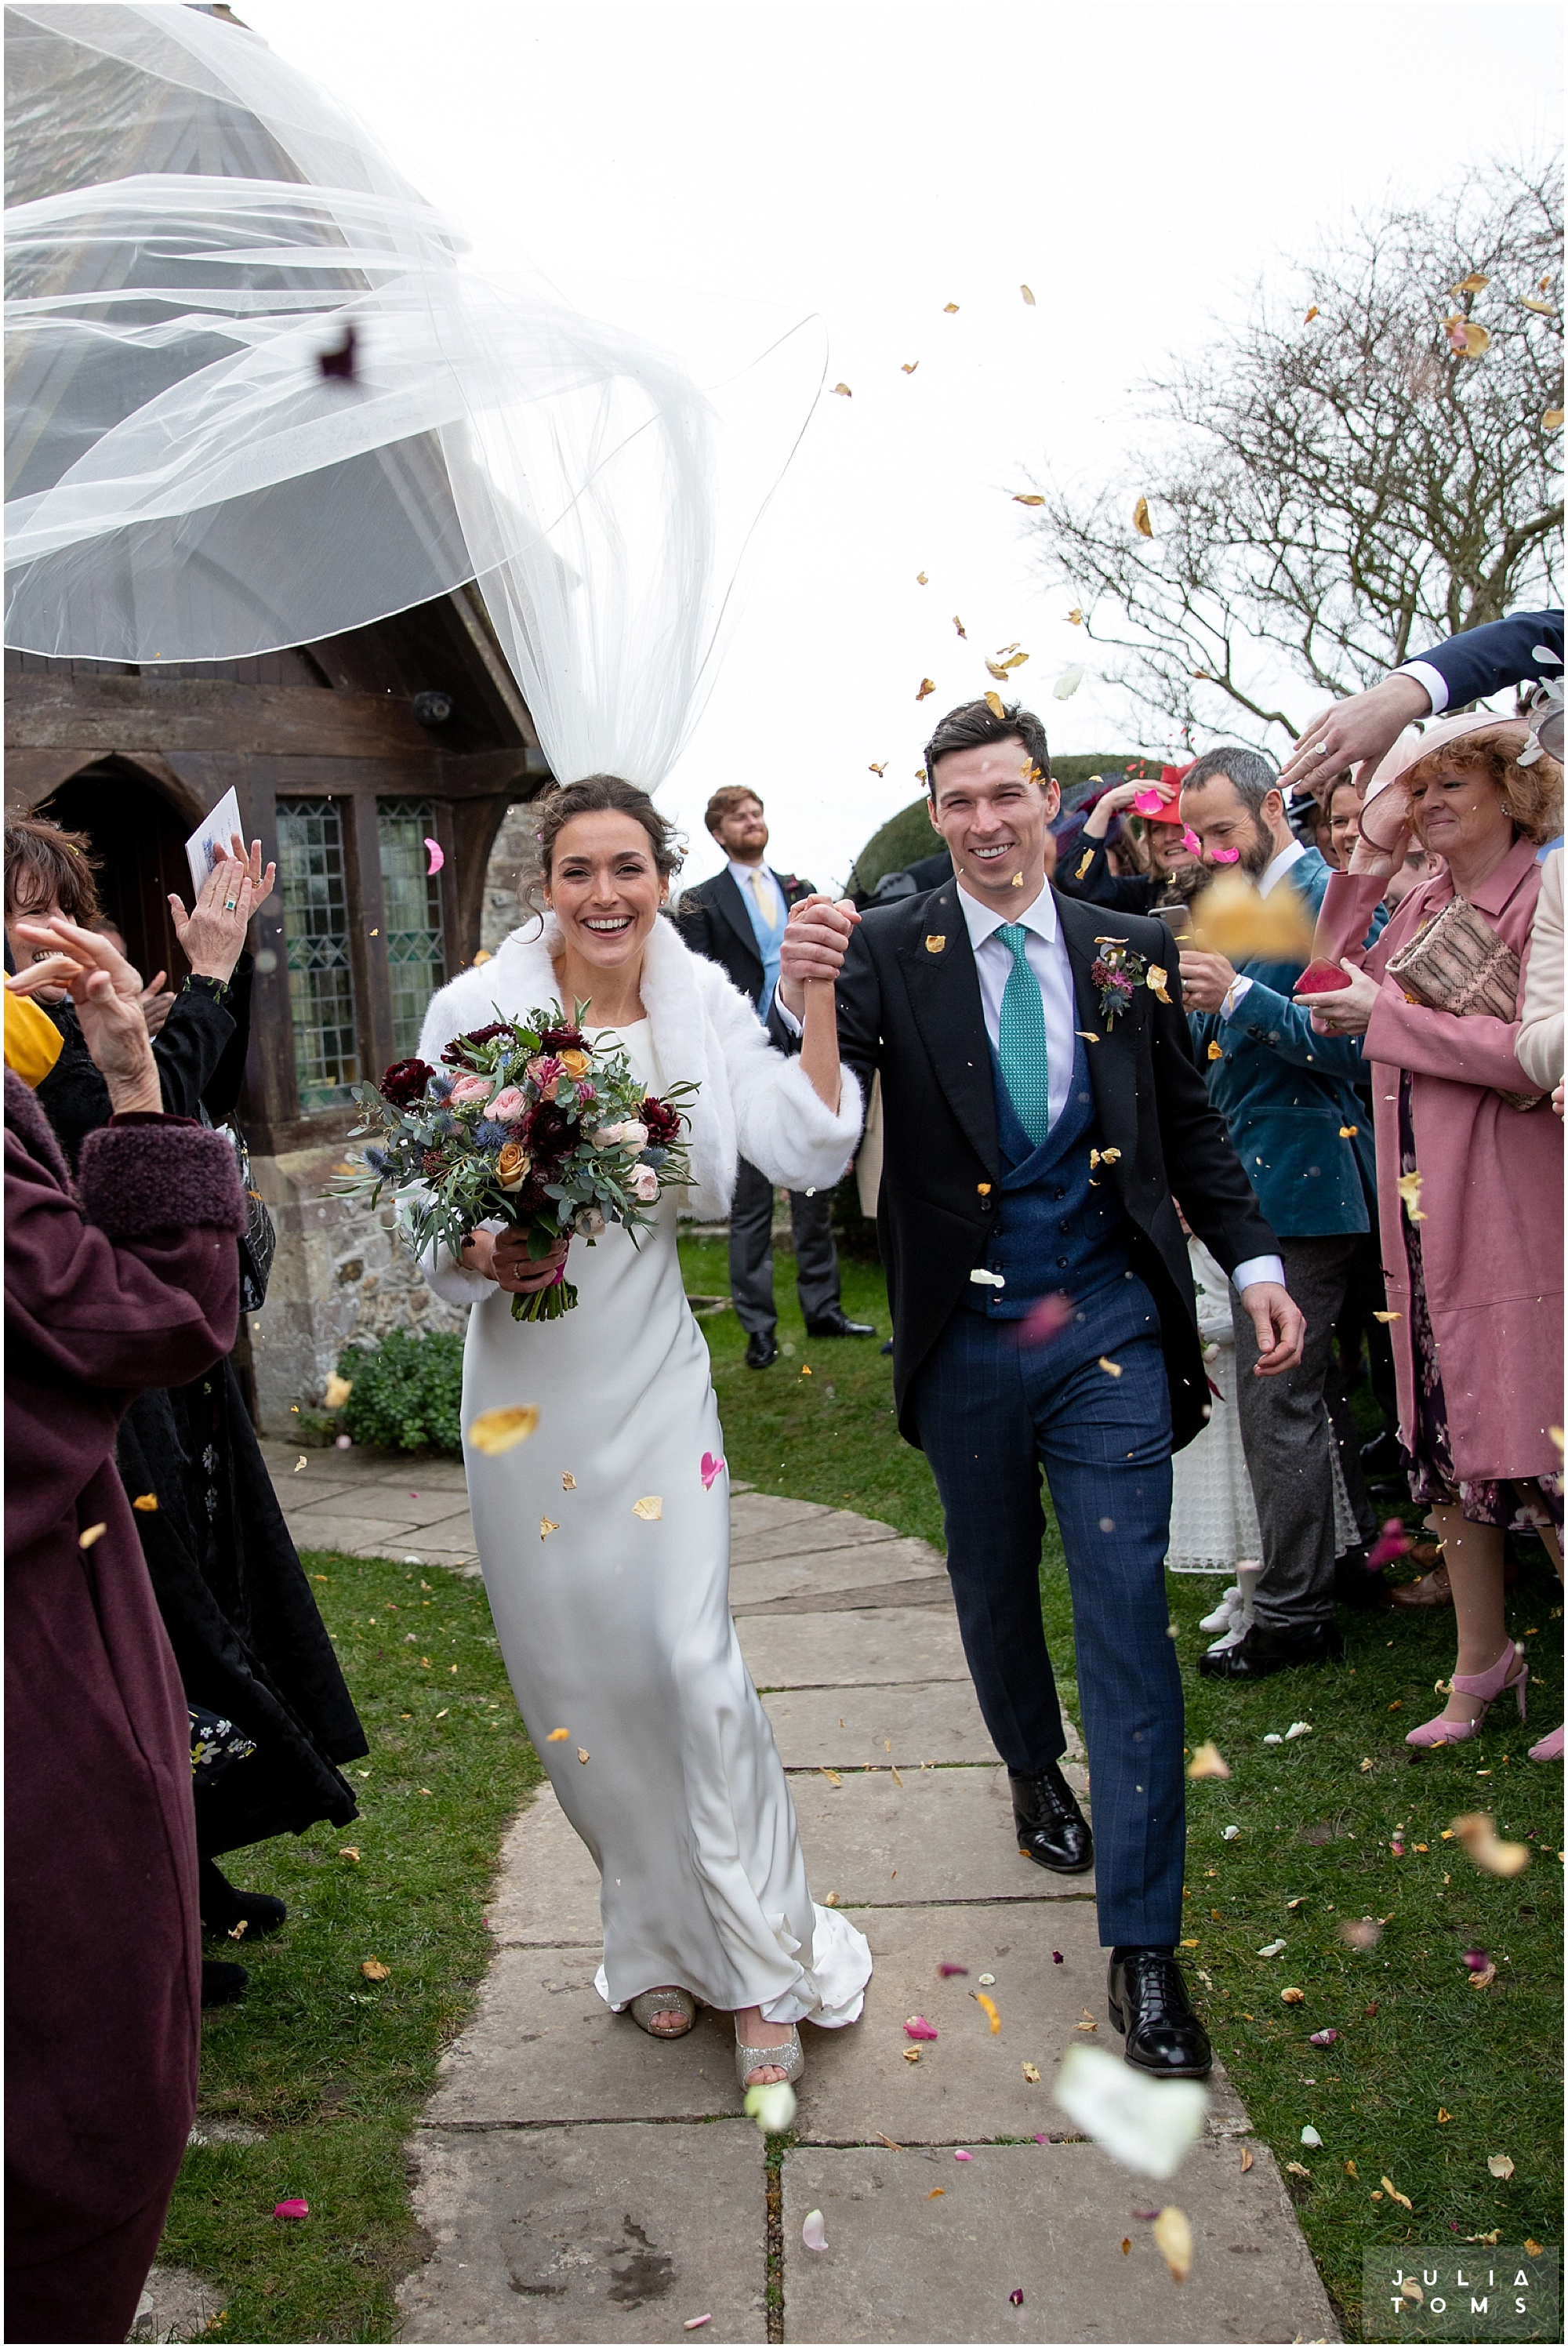 Southend_barn_wedding_photographer_juliatoms_008.jpg